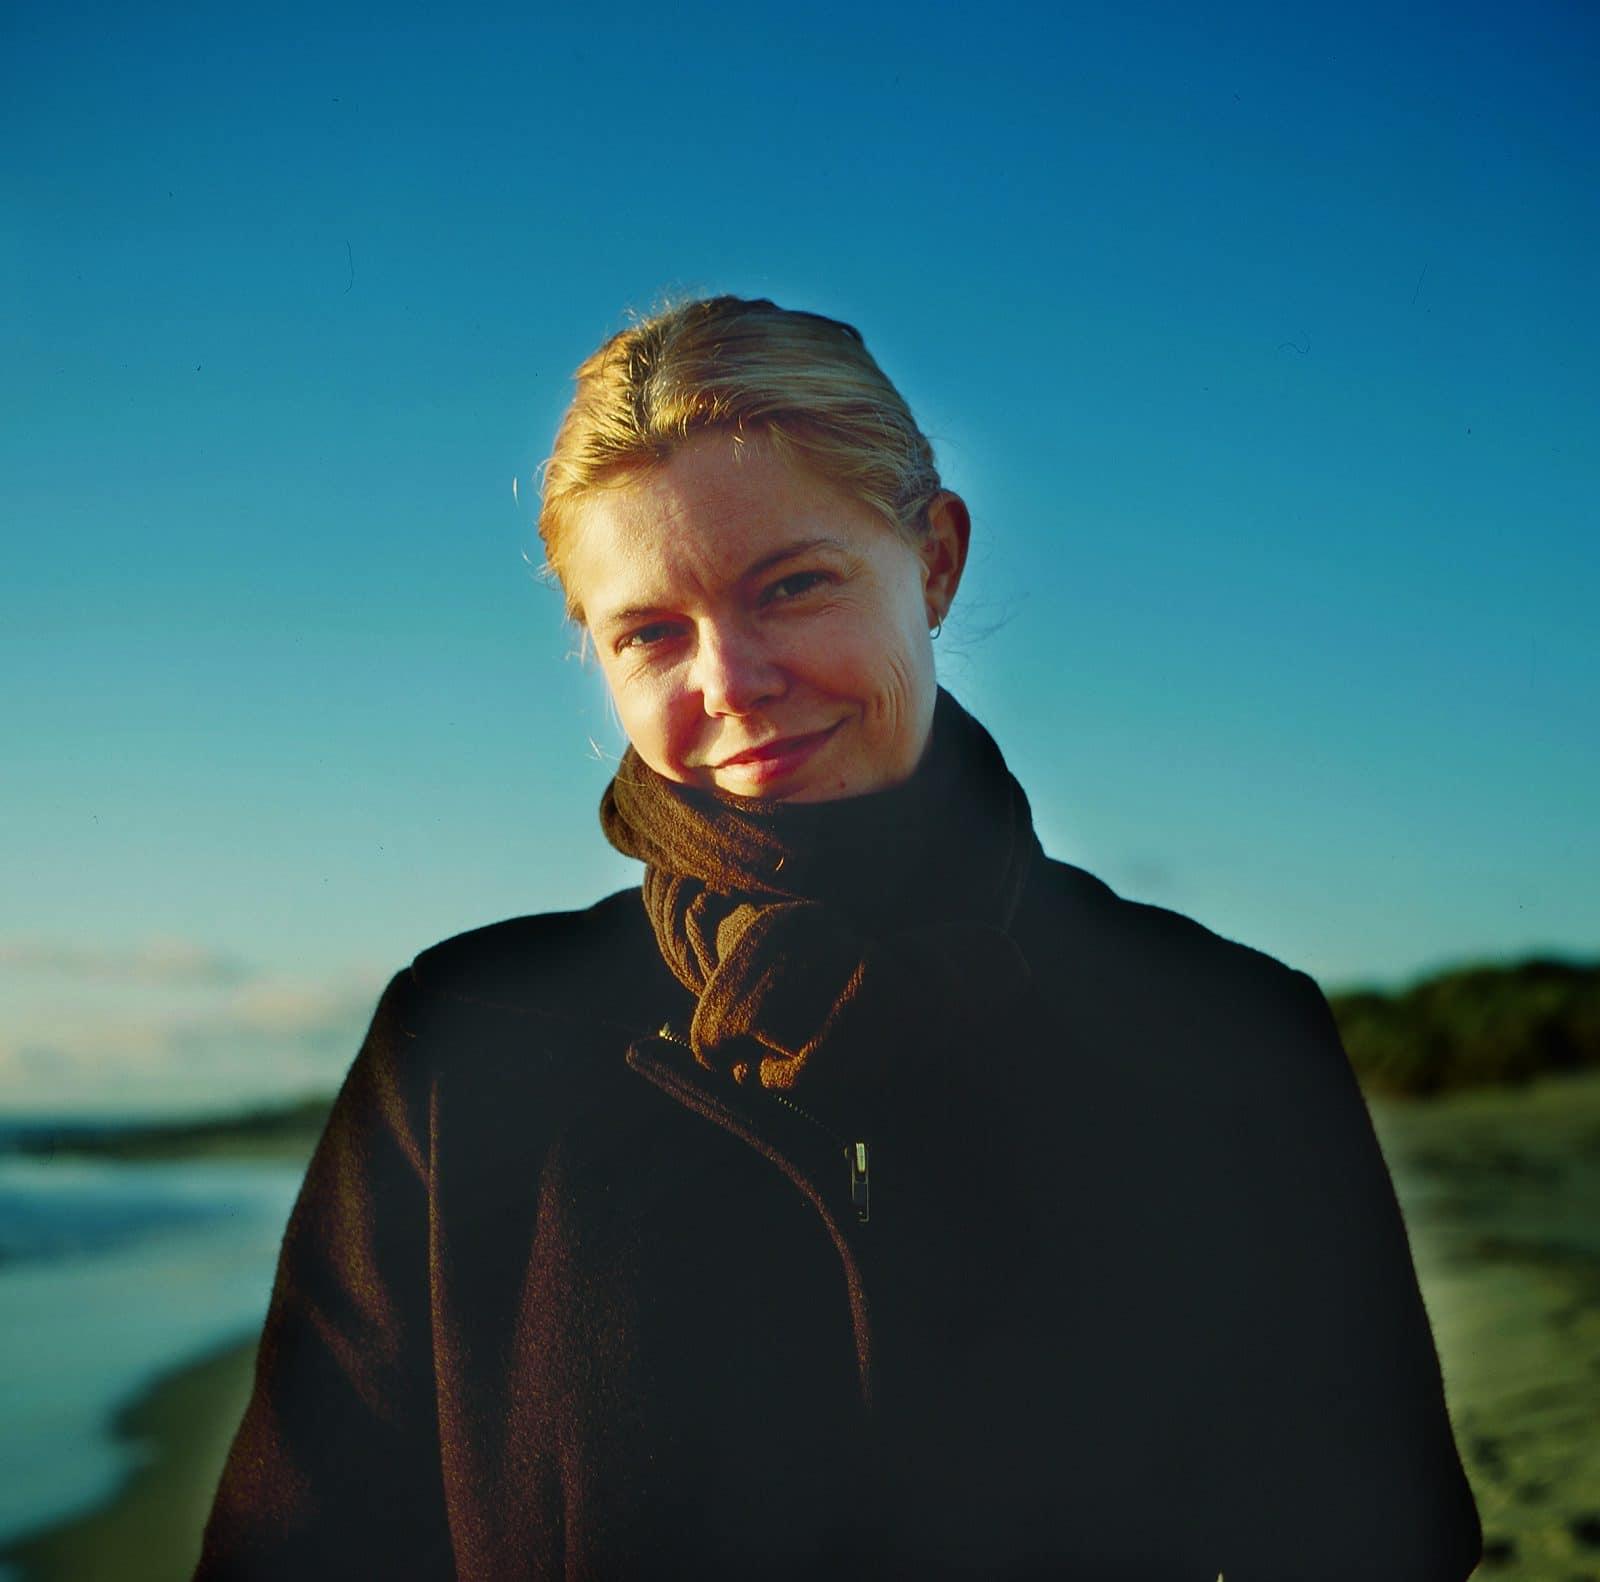 Anita Tjemsland